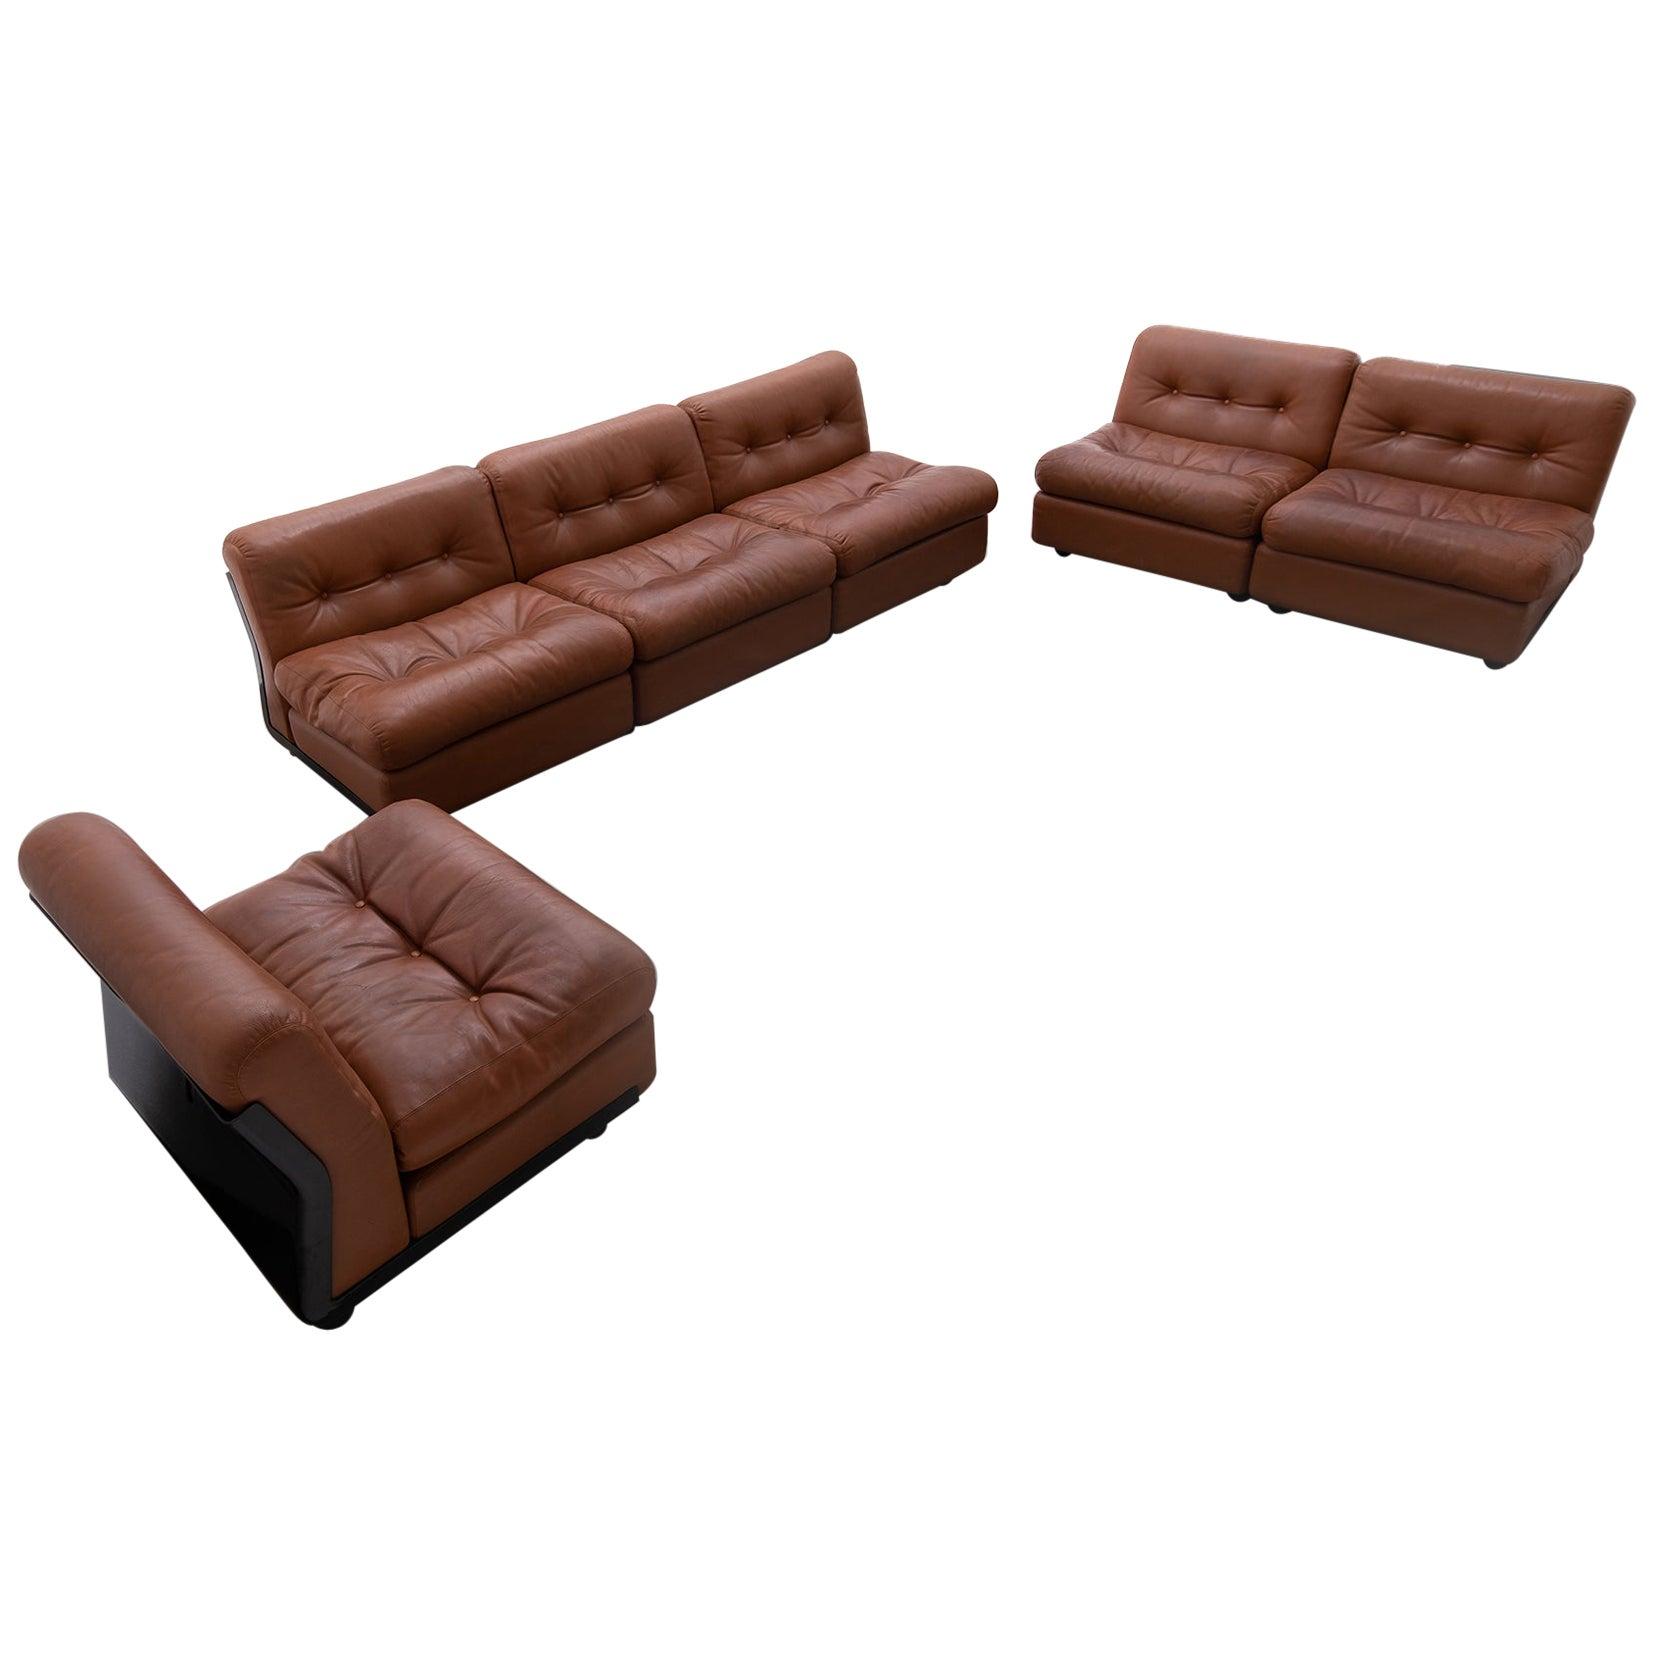 Sectional 'Amanta' sofa set by Mario Bellini for B&B Italia